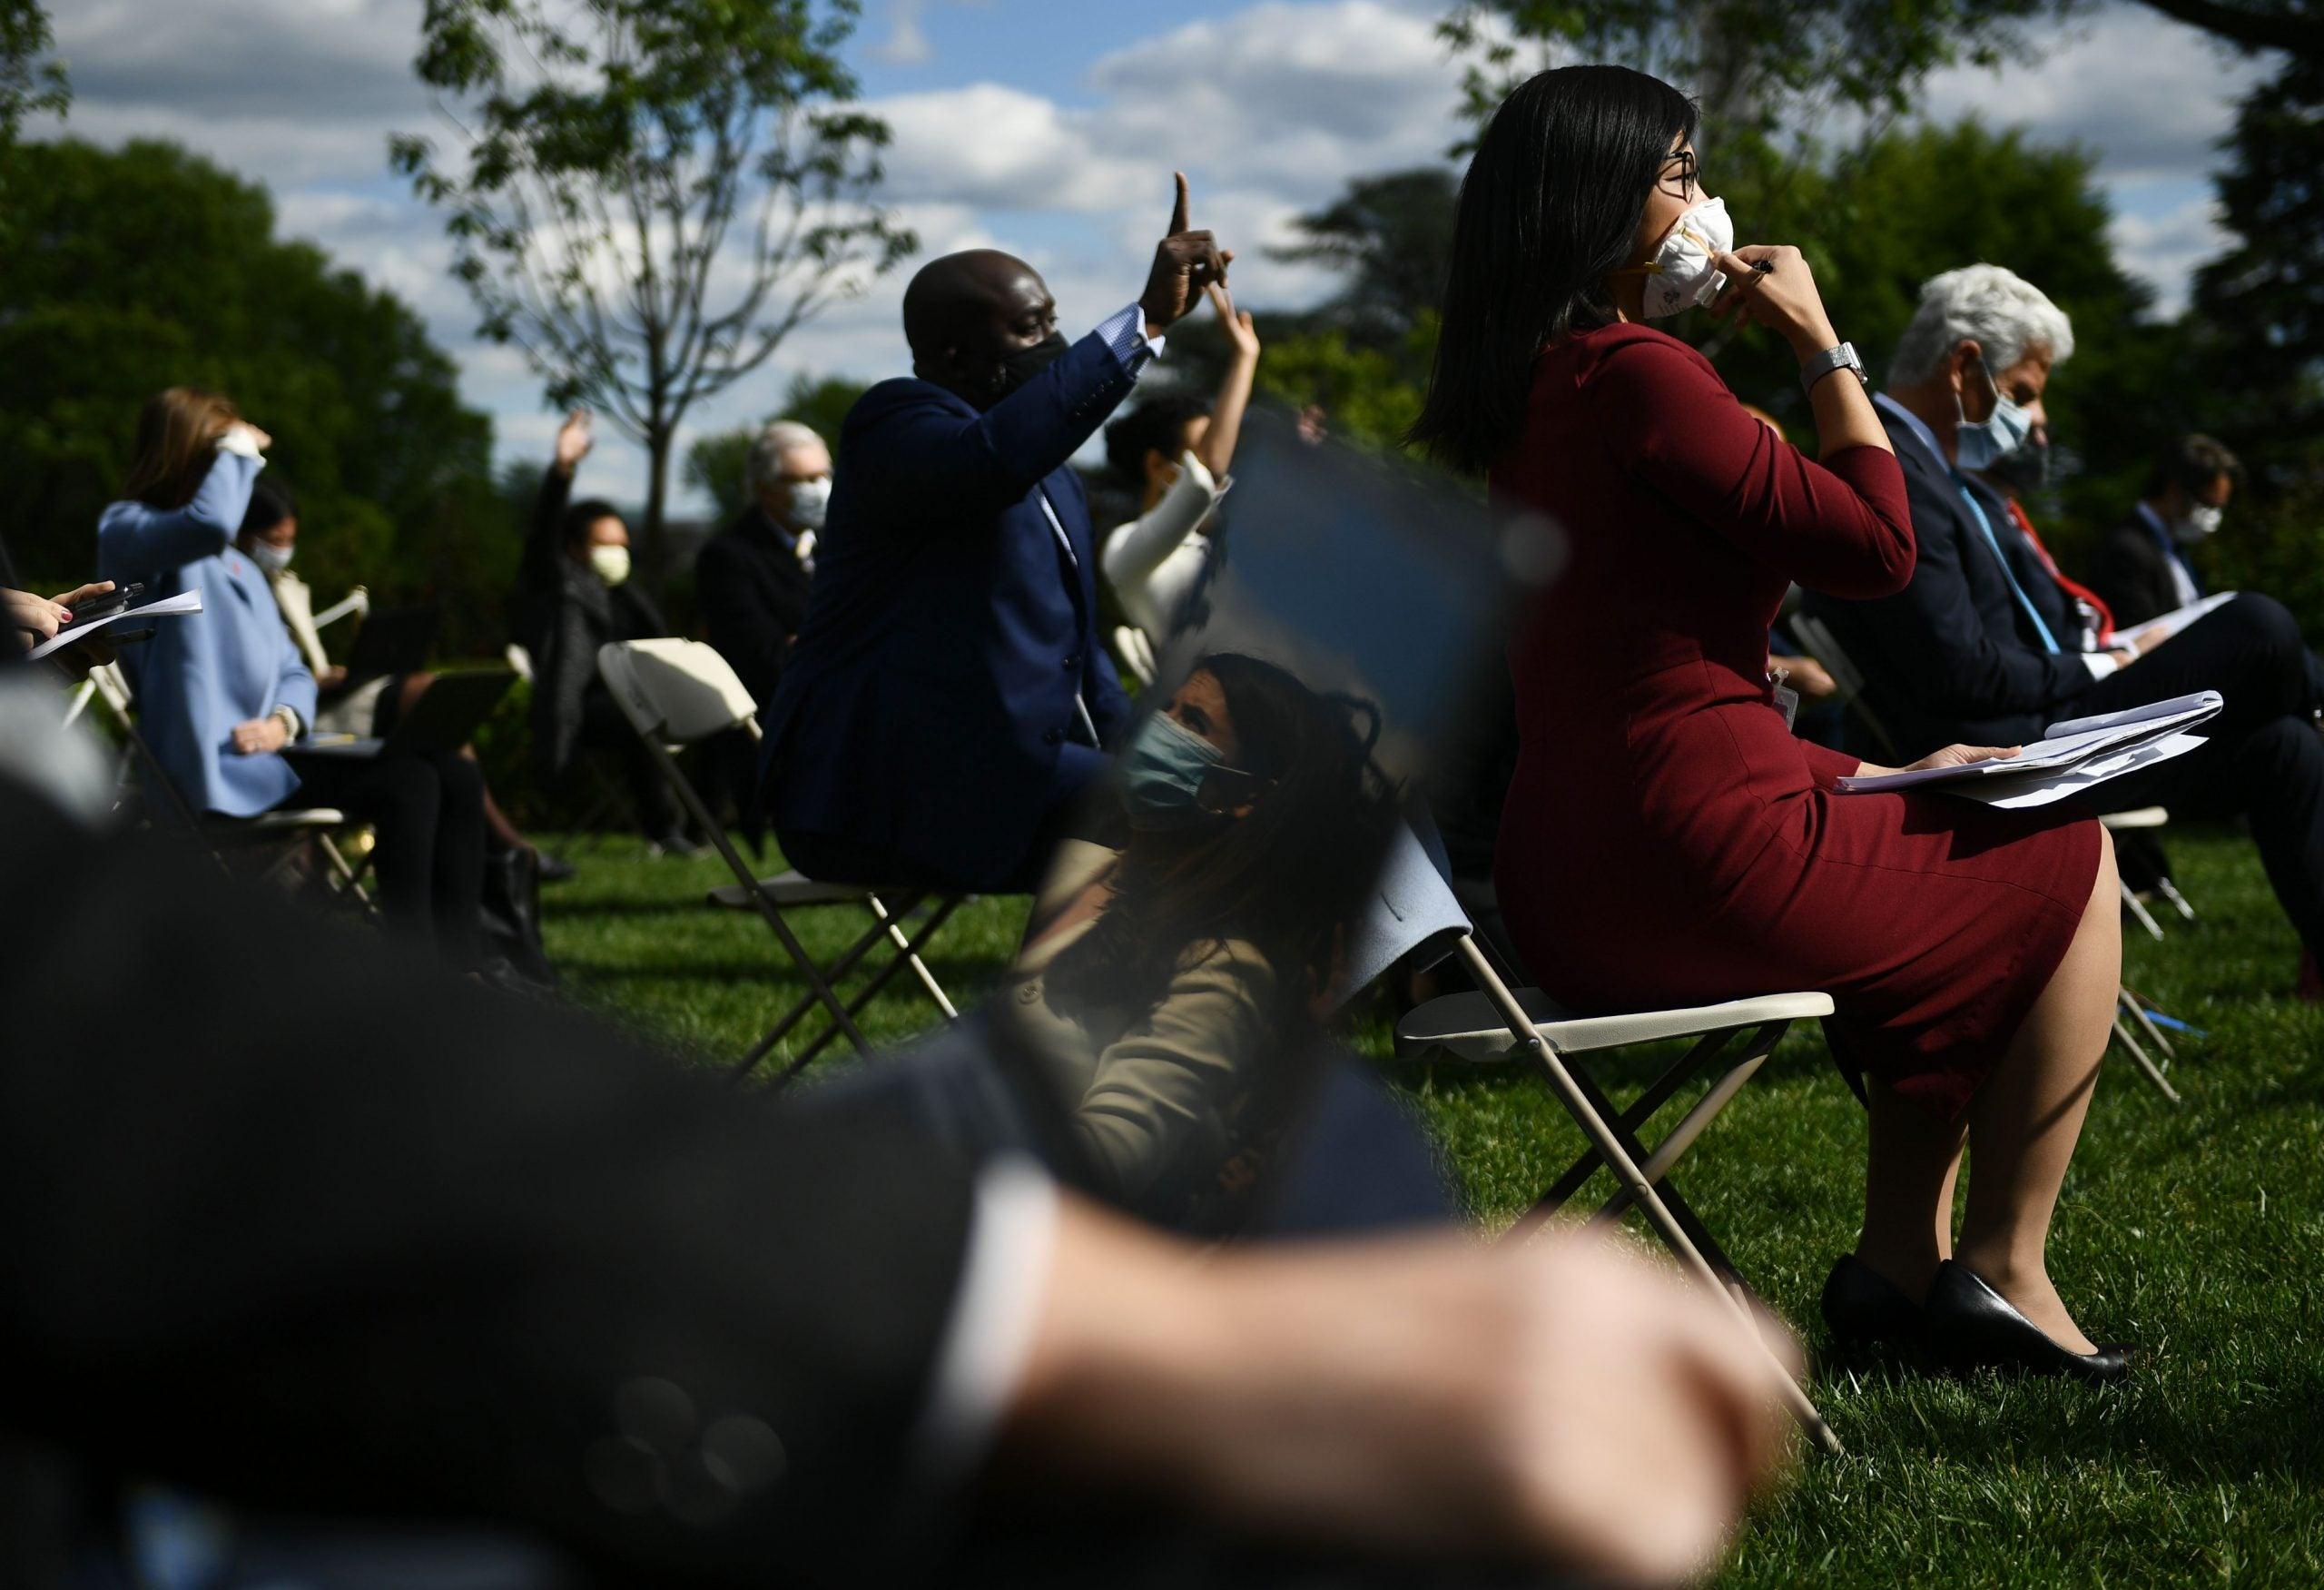 Weijia Jiang at White House press briefing